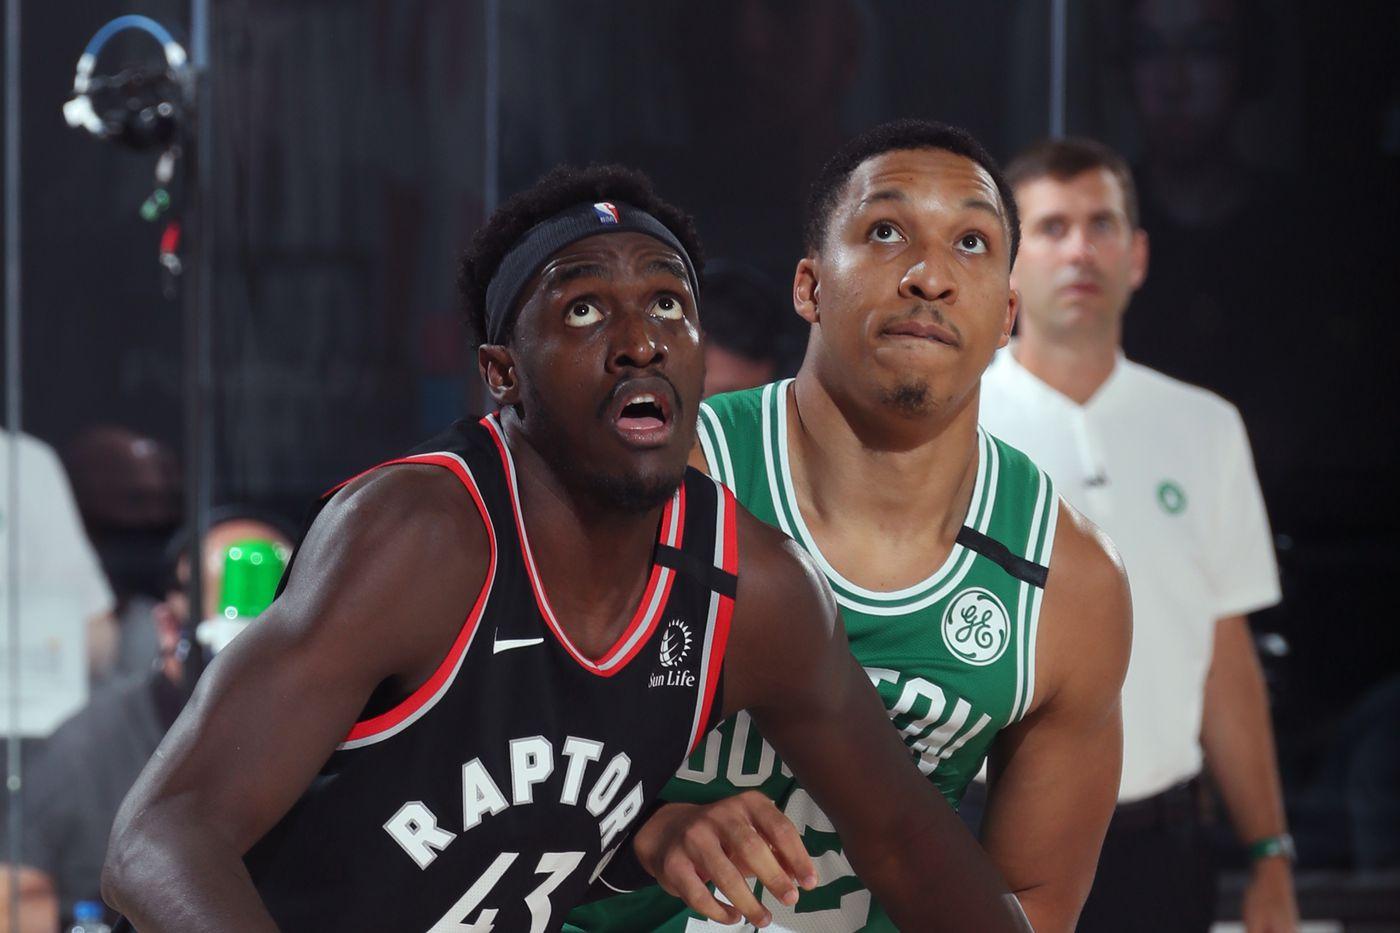 Nba Playoffs 2020 Game 4 Thread Toronto Raptors Vs Boston Celtics Raptors Hq